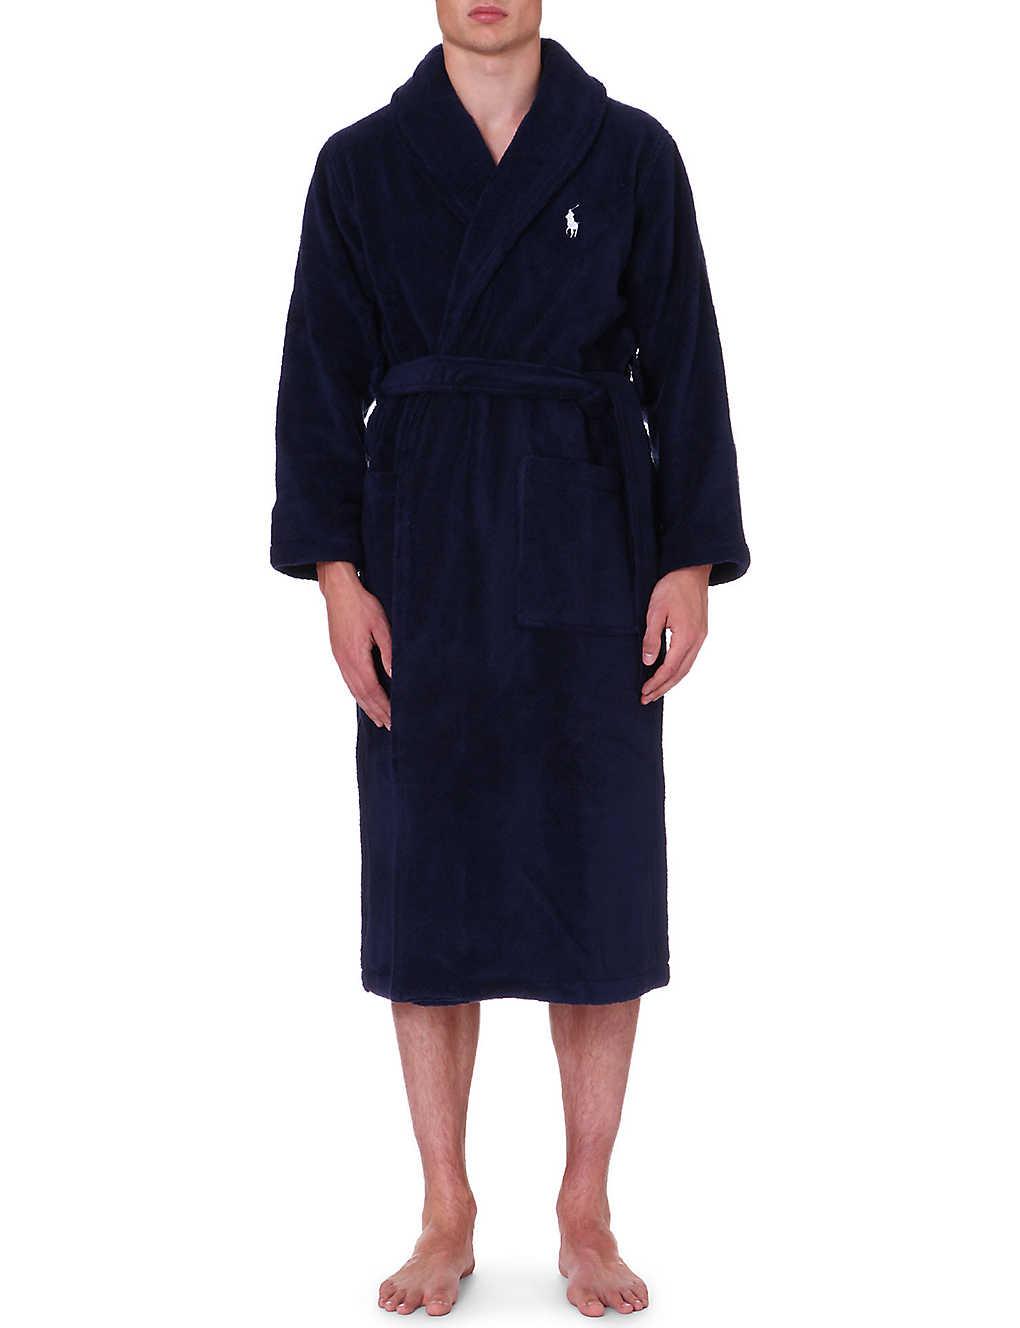 Dressing Gowns - Nightwear & loungewear - Clothing - Mens ...